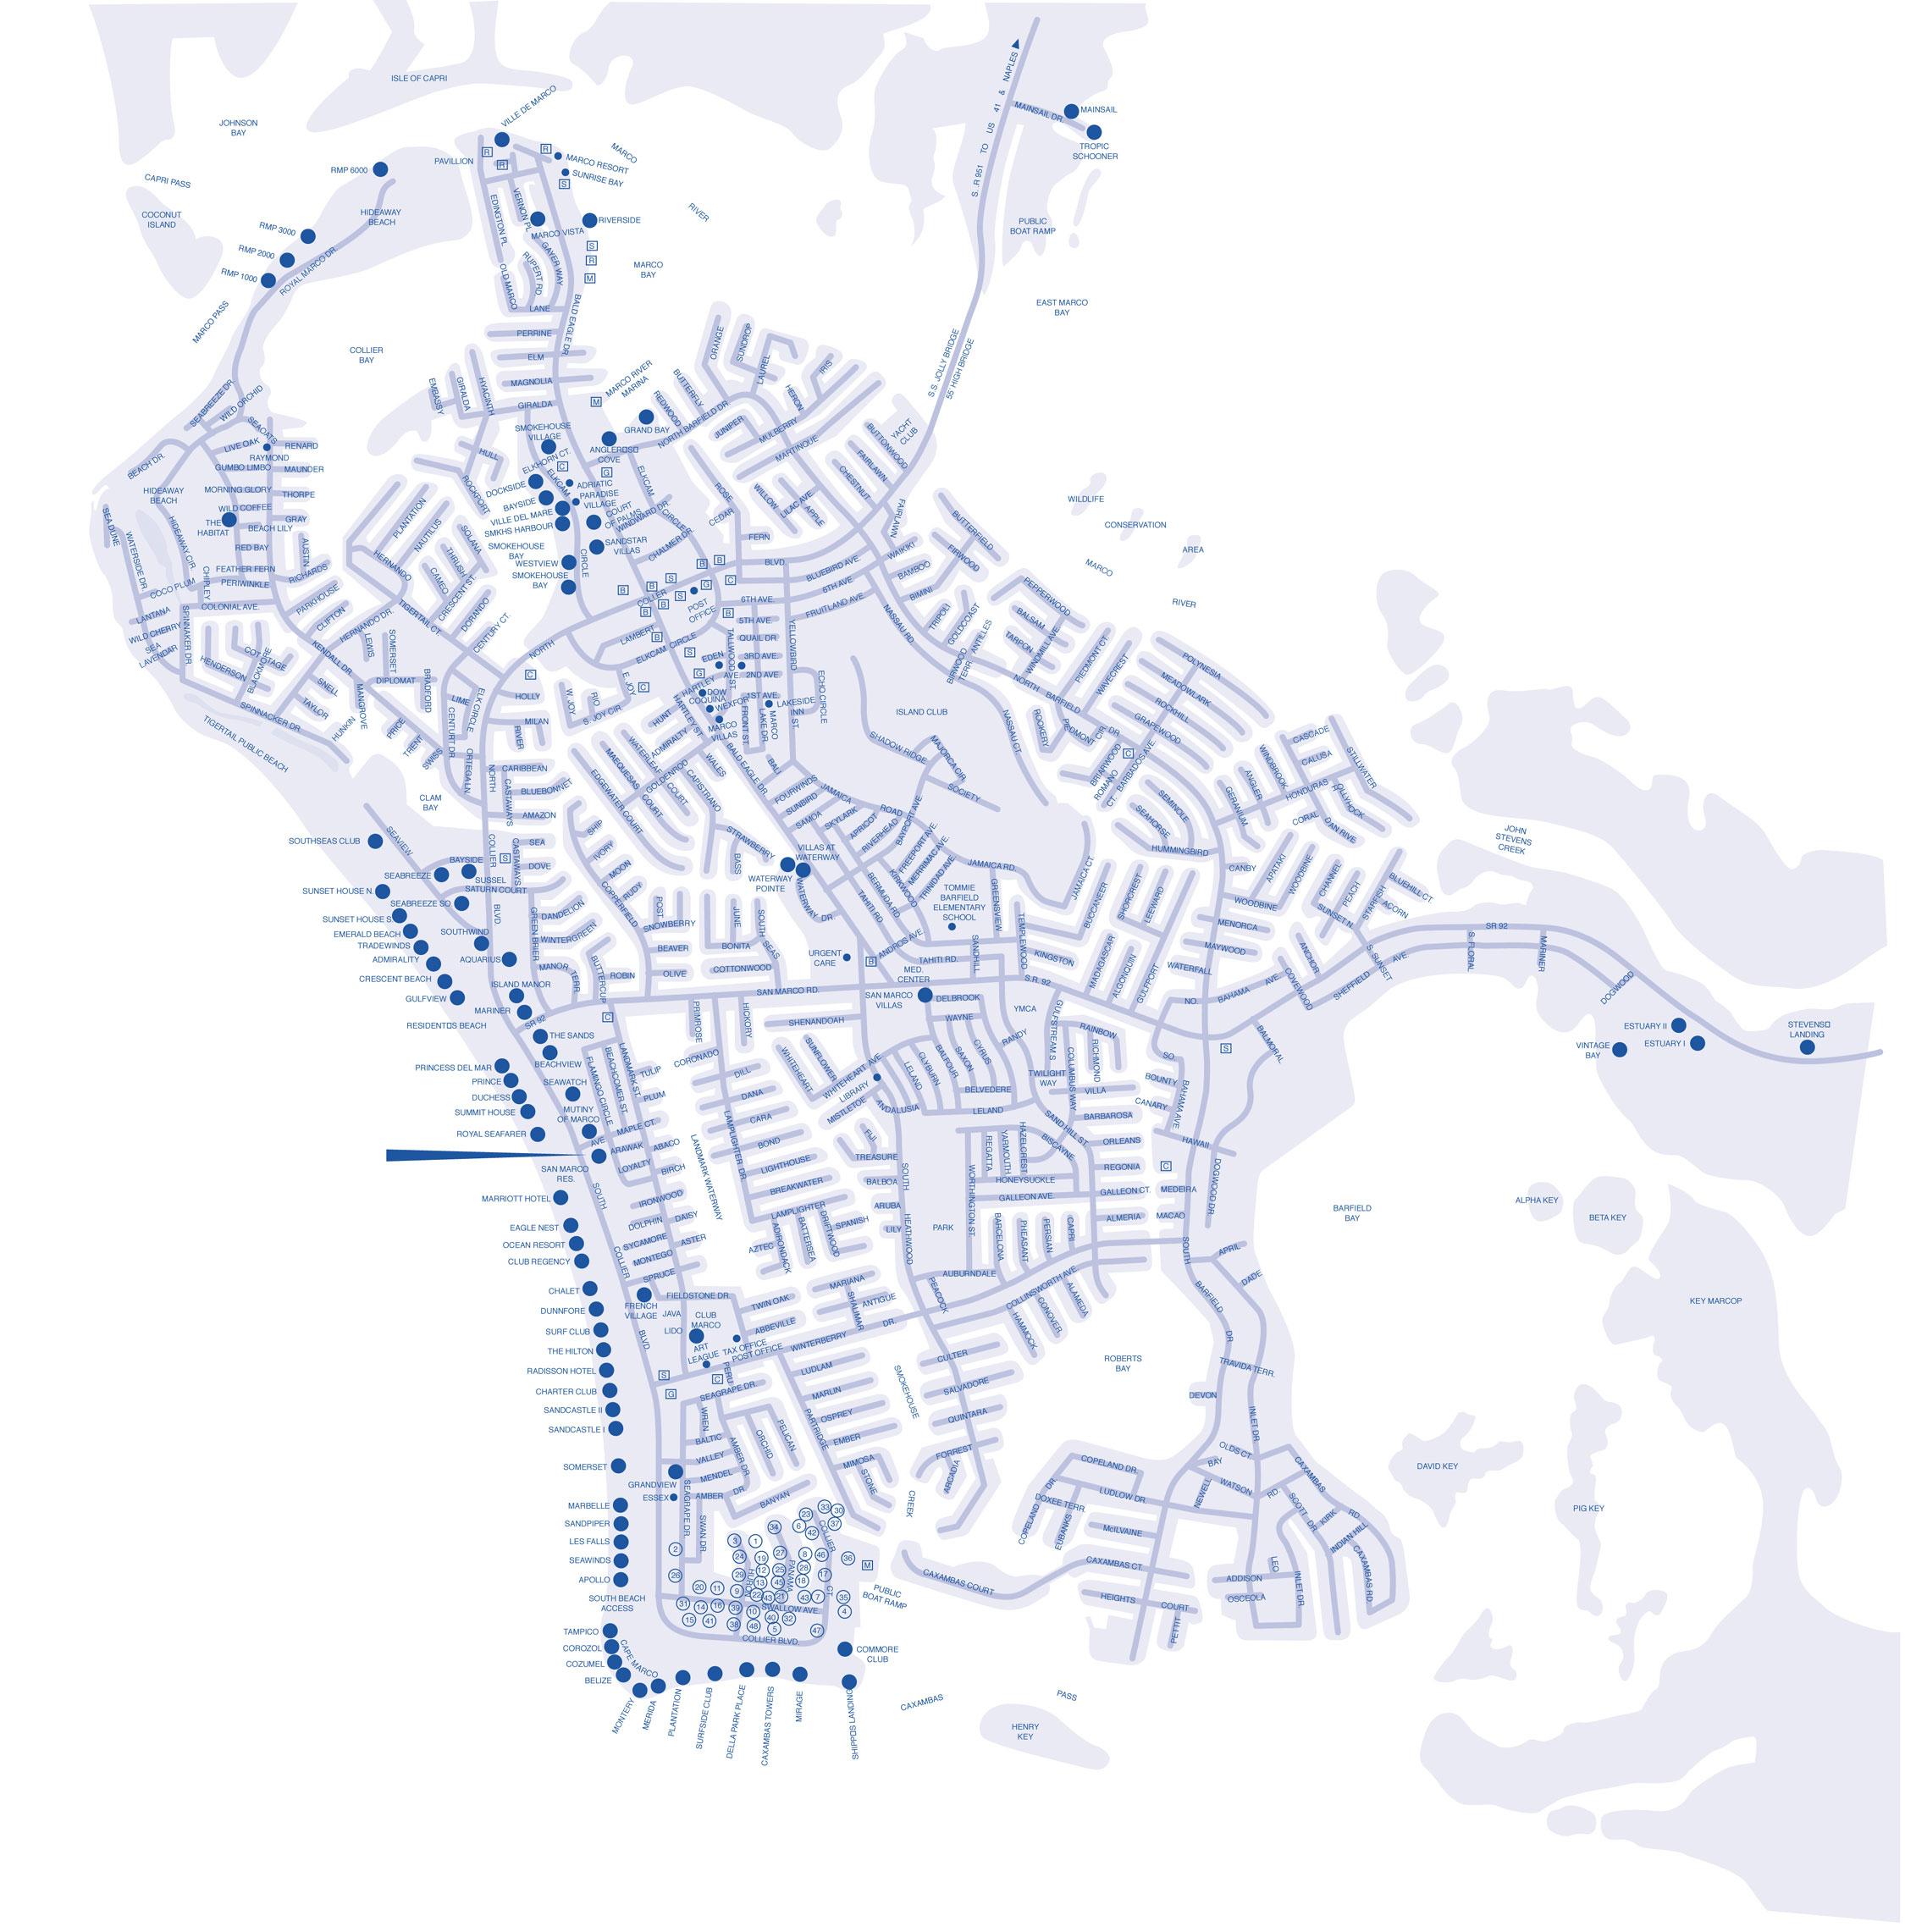 Marco Island Hotel Map - Marco Island Florida • Mappery - San Marcos Island Florida Map